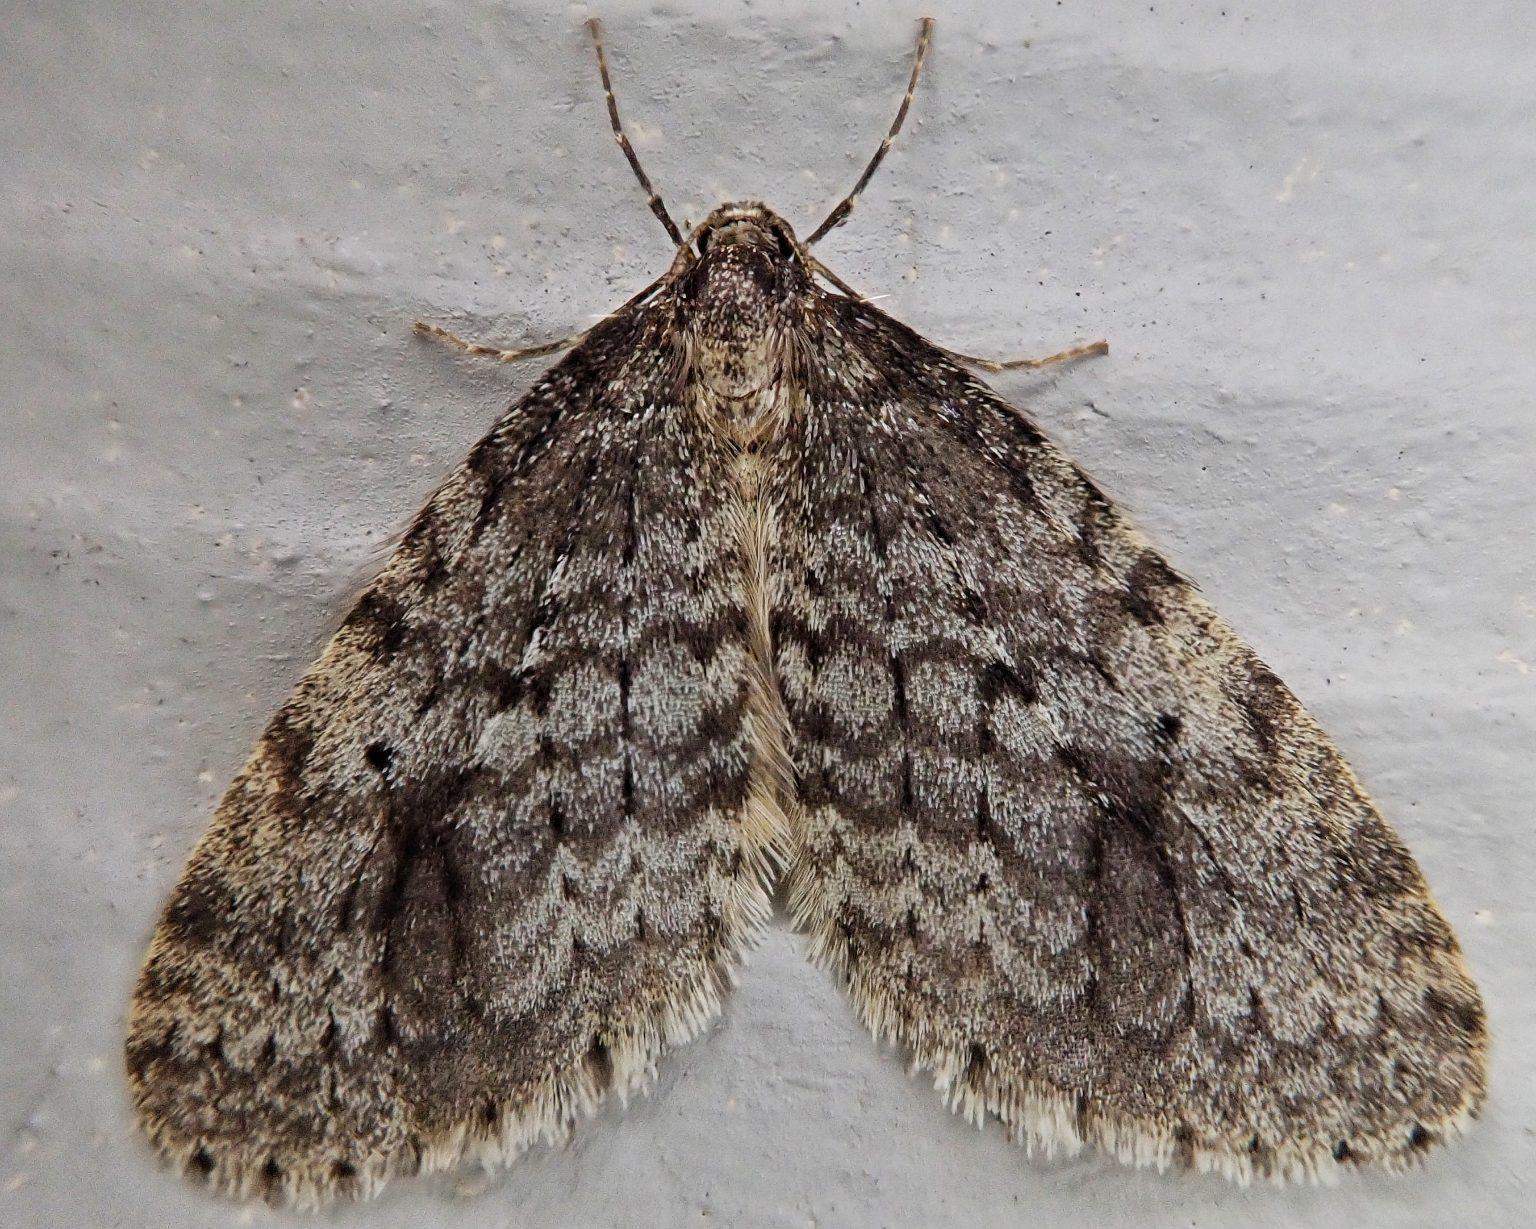 Operophtera occidentalis